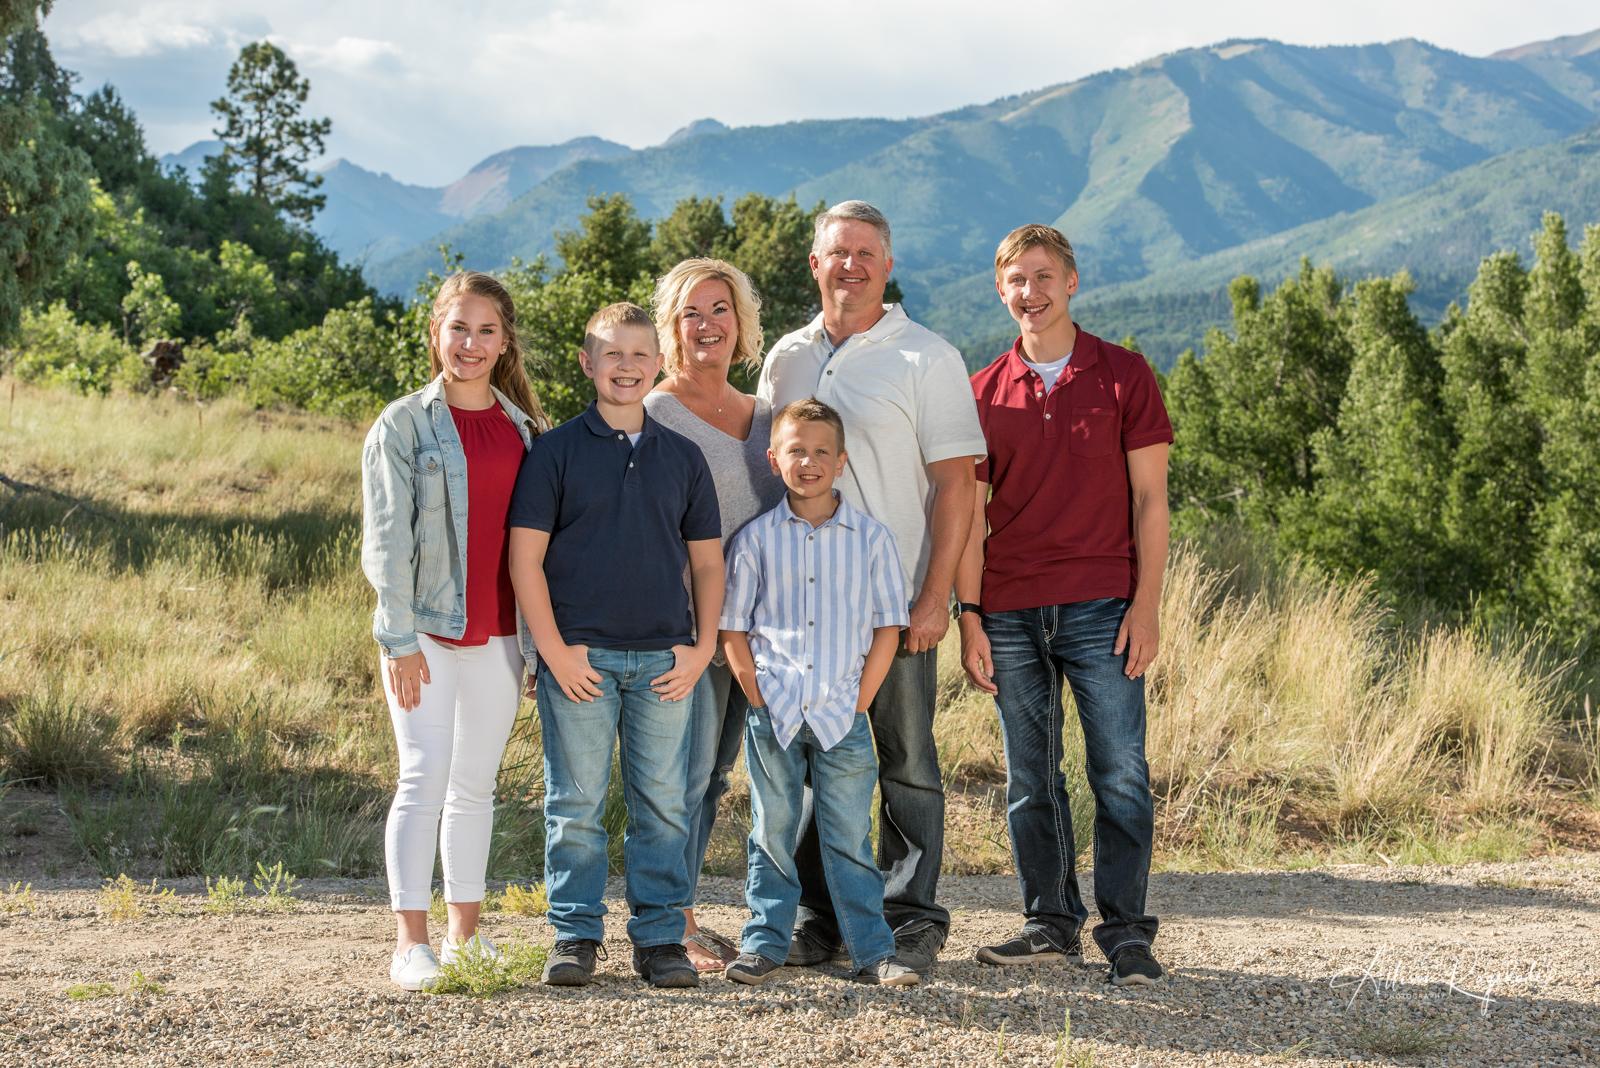 Allison Ragsdale Photography in Durango Colorado